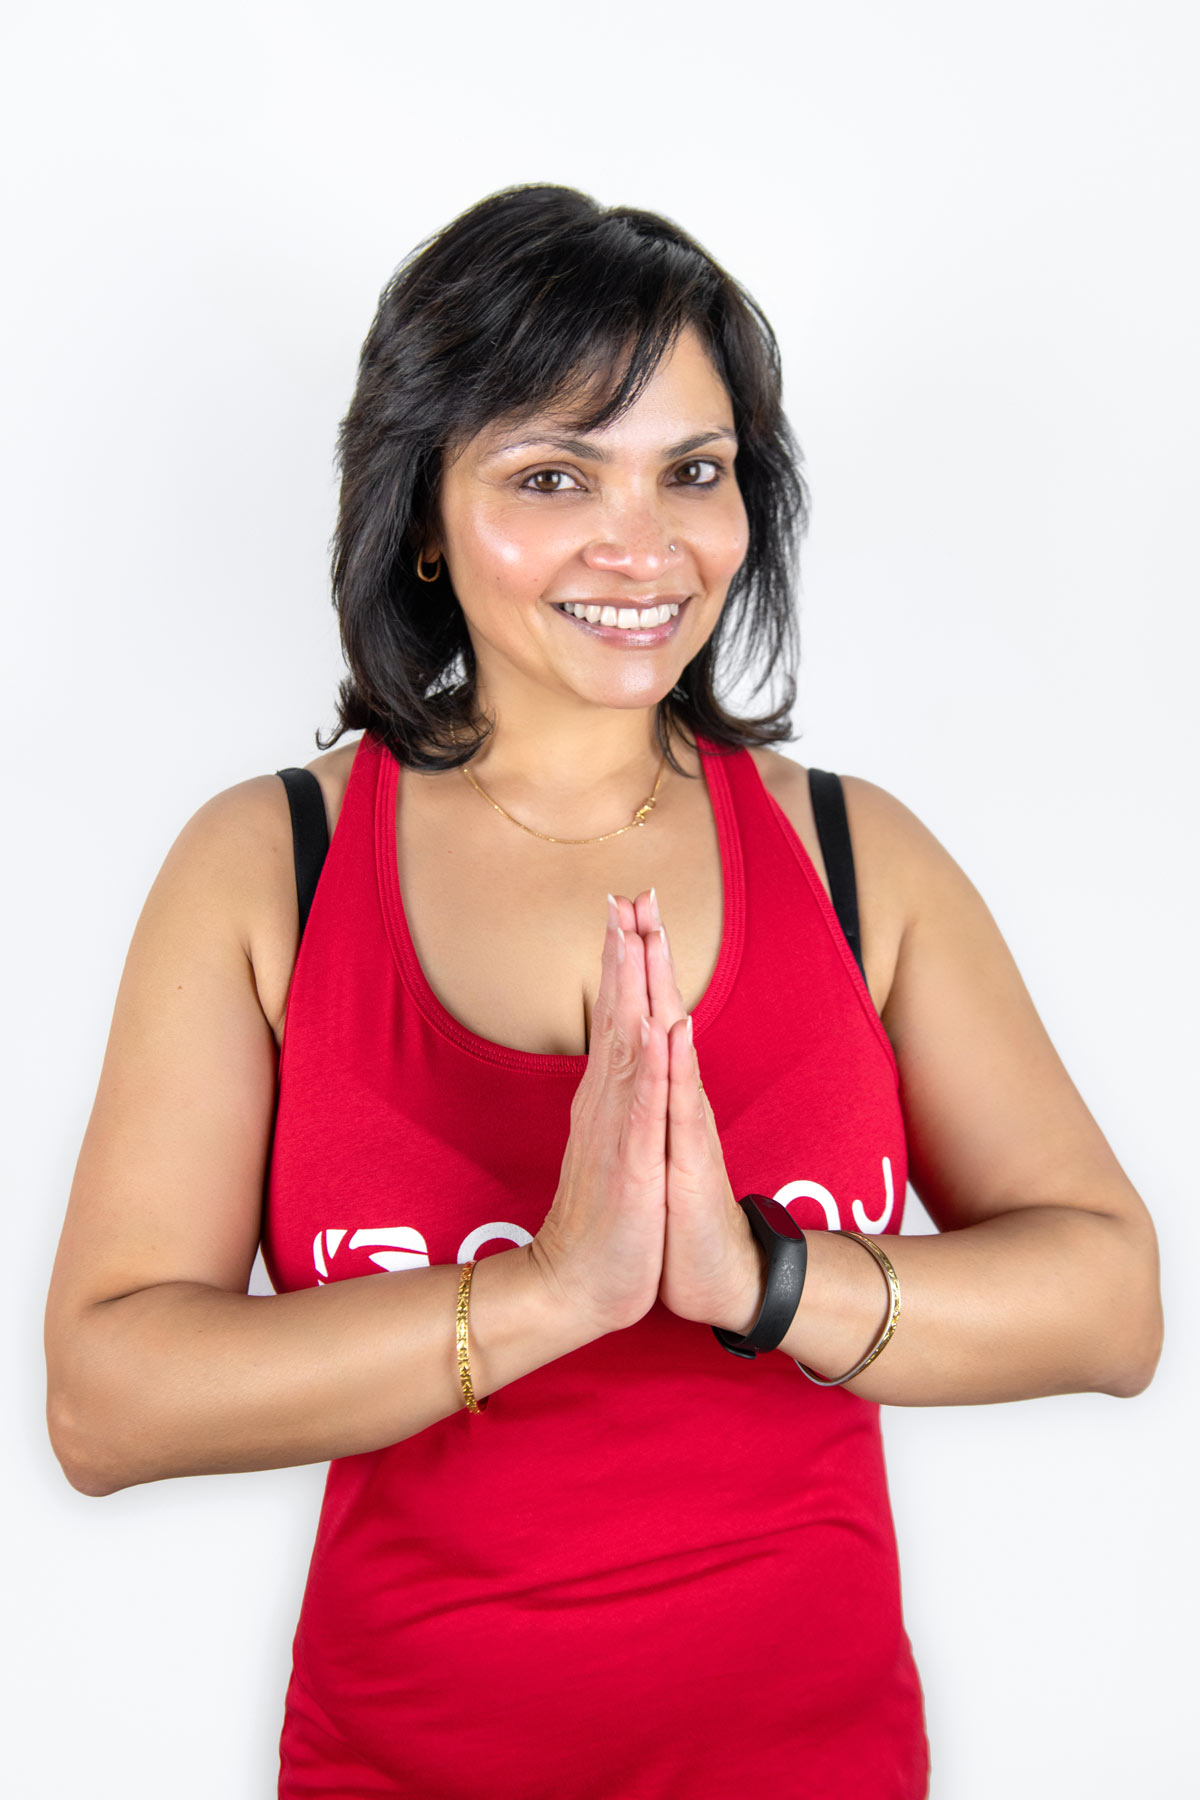 Kaurobi-Pandit-Oranj-Fitness